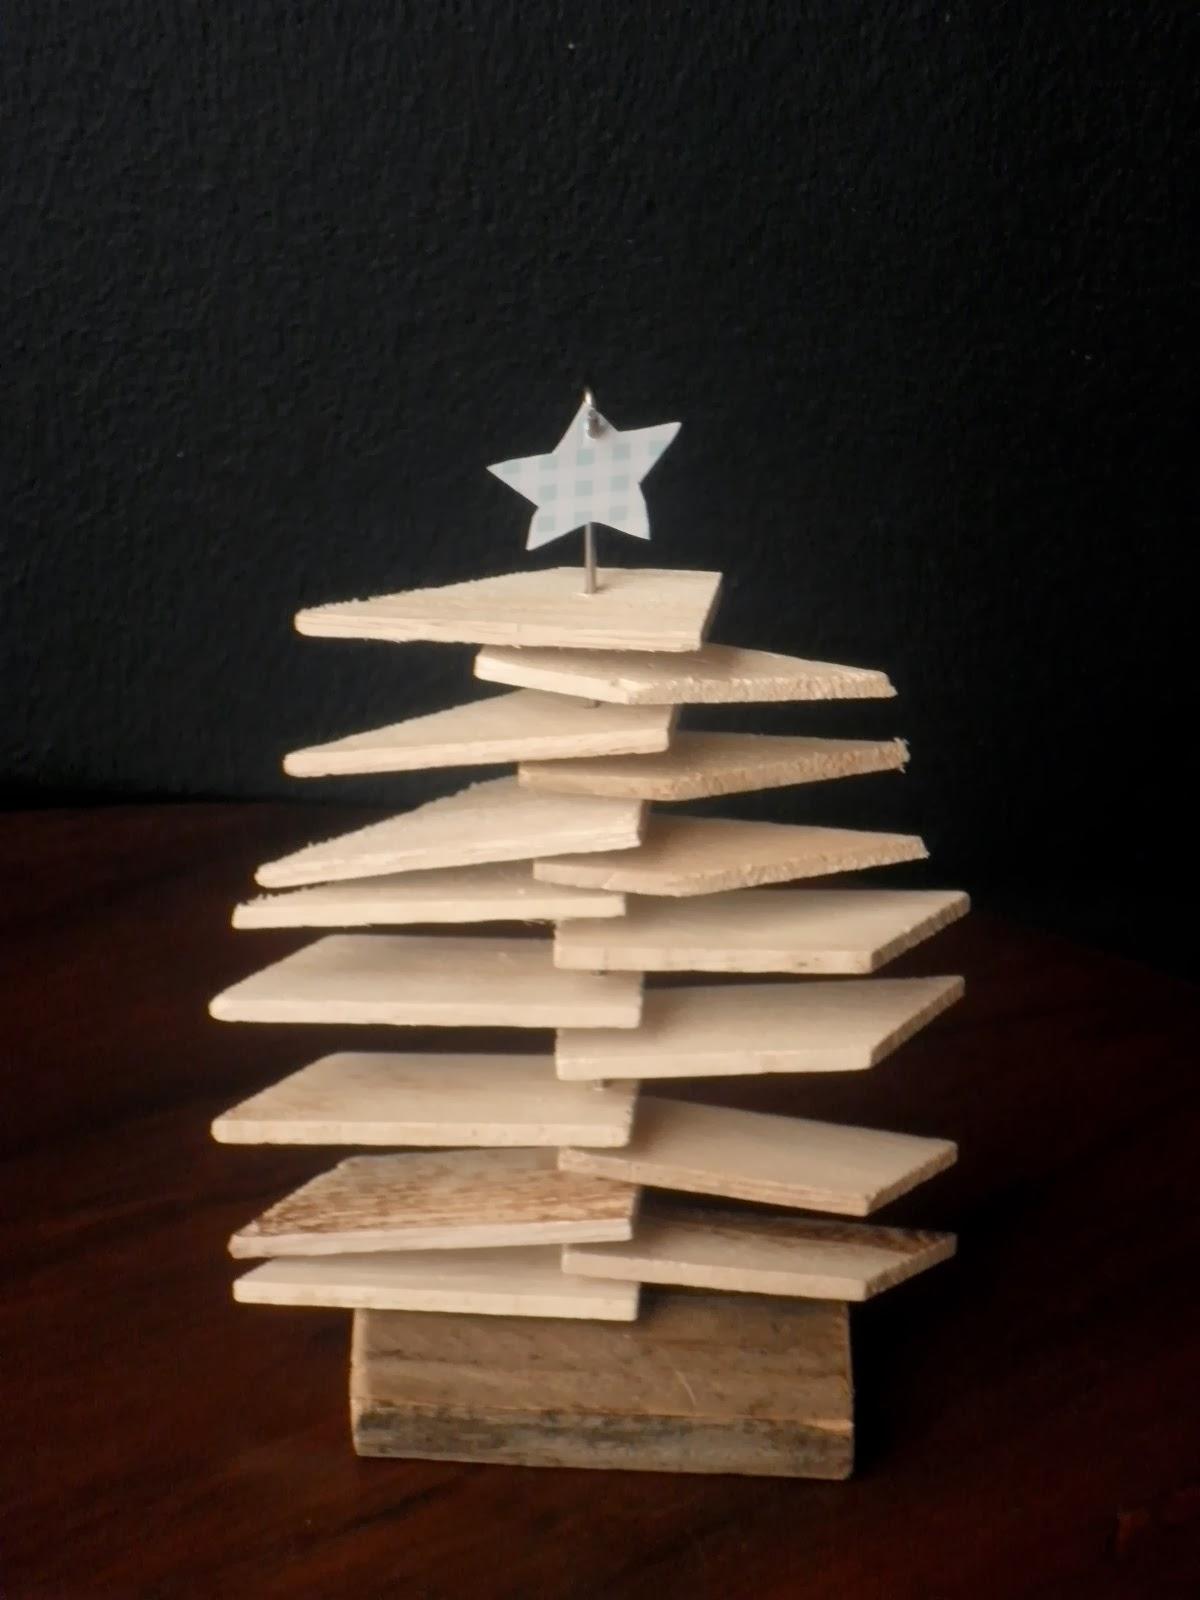 Makeover addict: Mini drveno božićno drvce za 0 kuna!